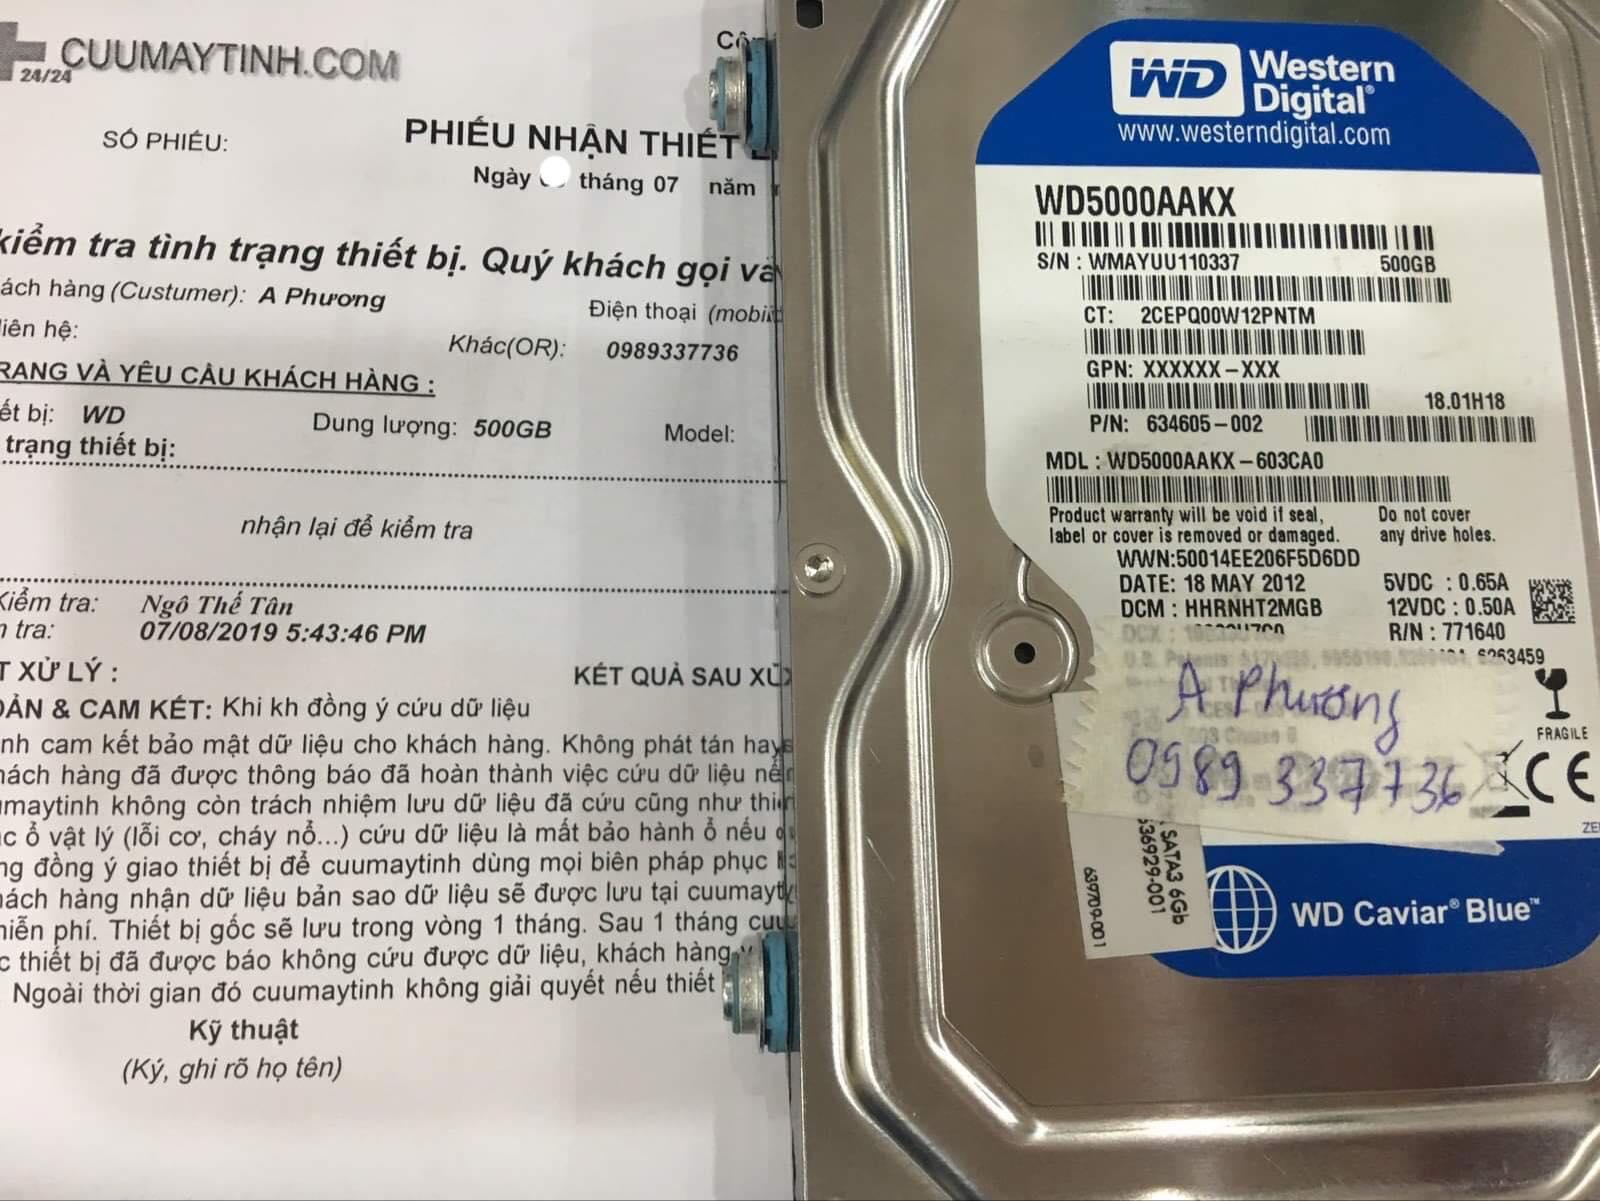 Khôi phục dữ liệu ổ cứng Western 500GB lỗi cơ 20/07/2019 - cuumaytinh